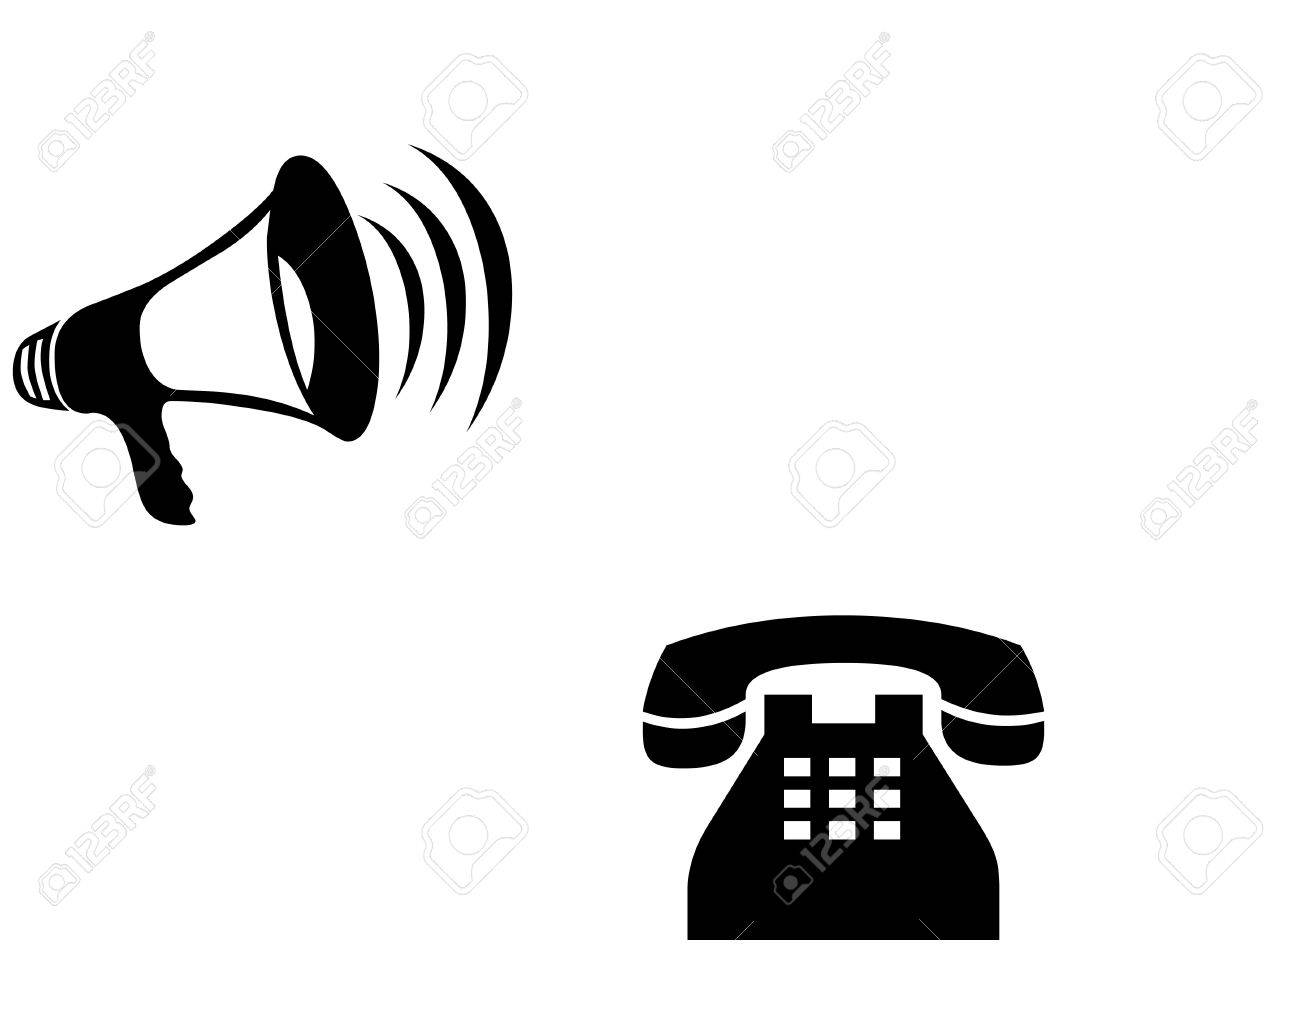 Speaker and telephone icons Stock Photo - 11731340